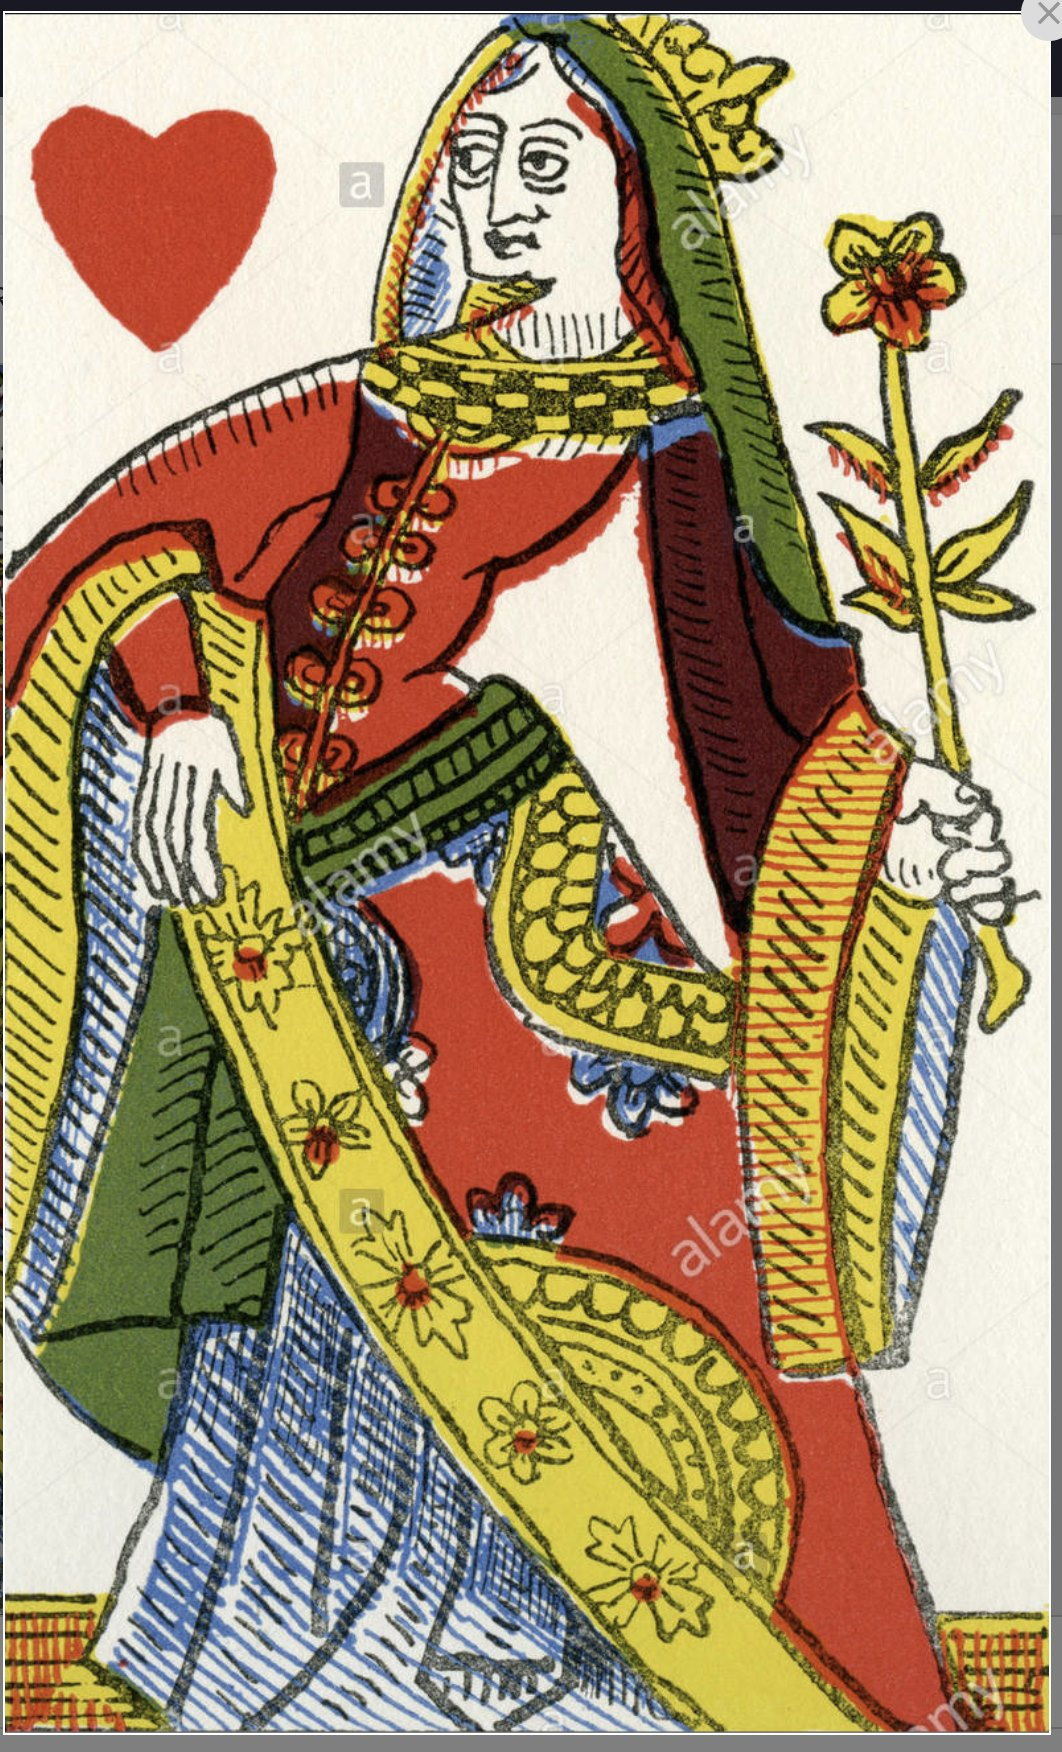 Rouen, by Pierre Marechal, c. 1567